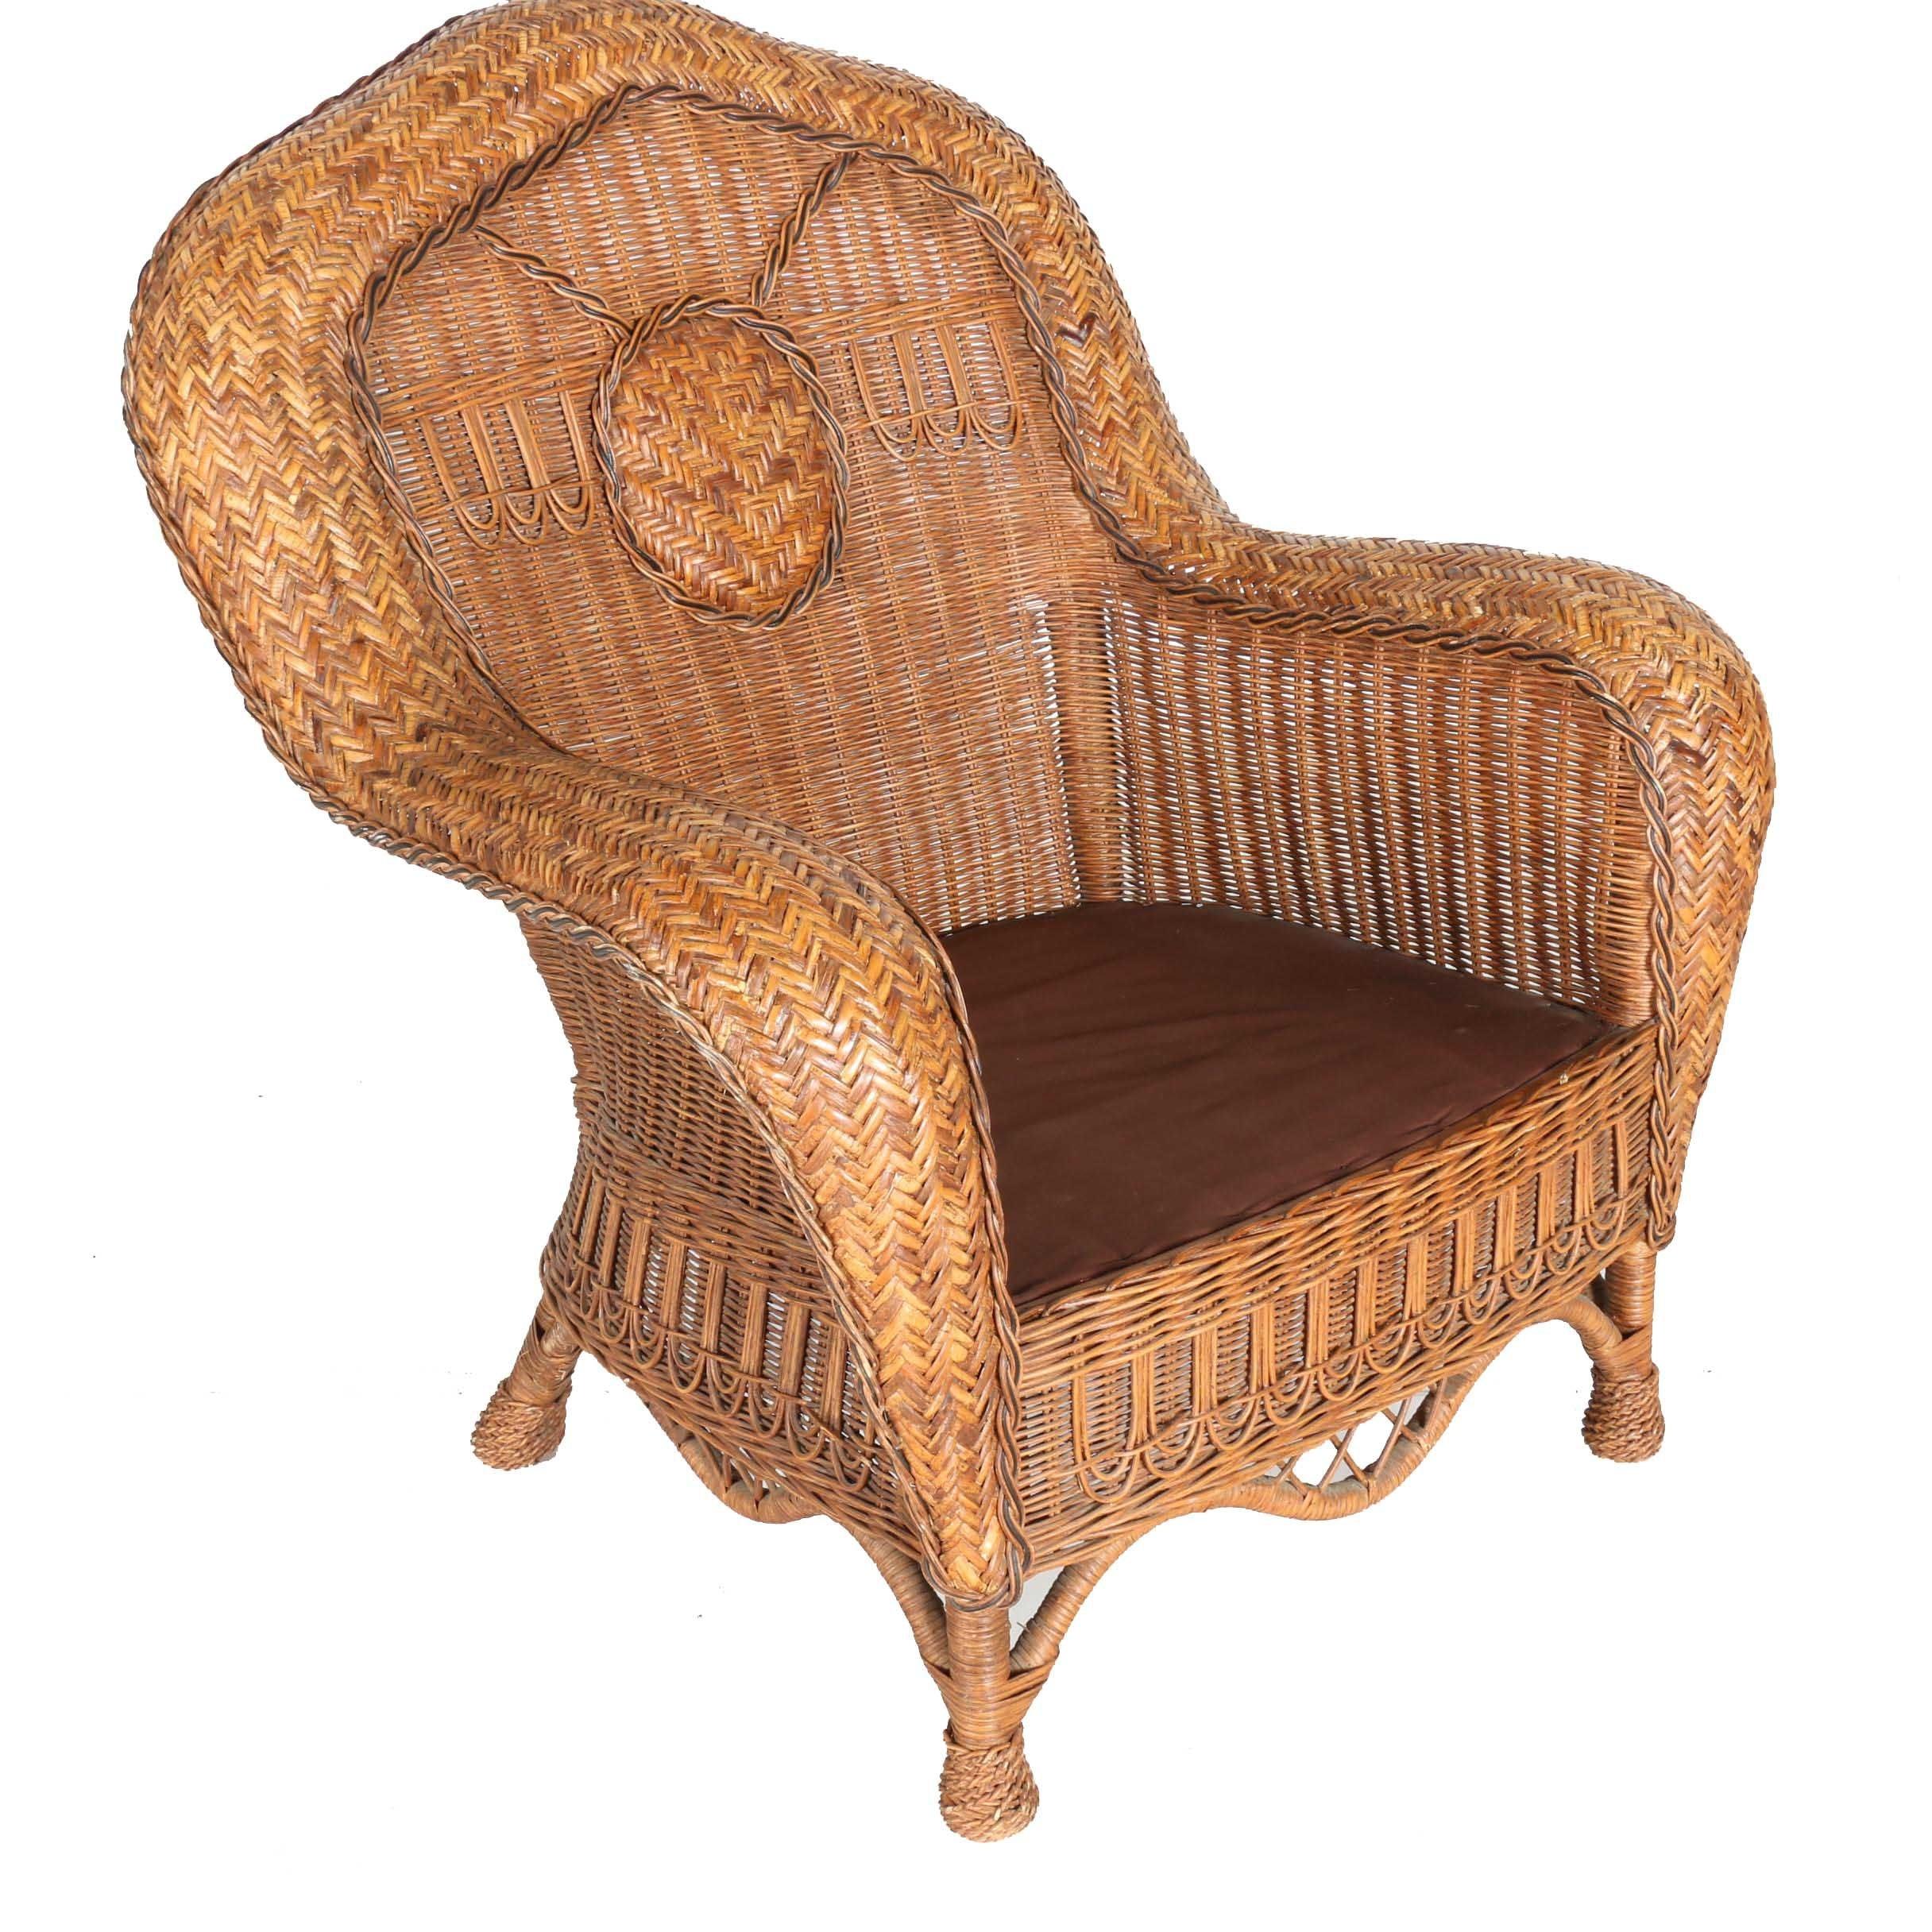 Rattan Armchair With Cushions